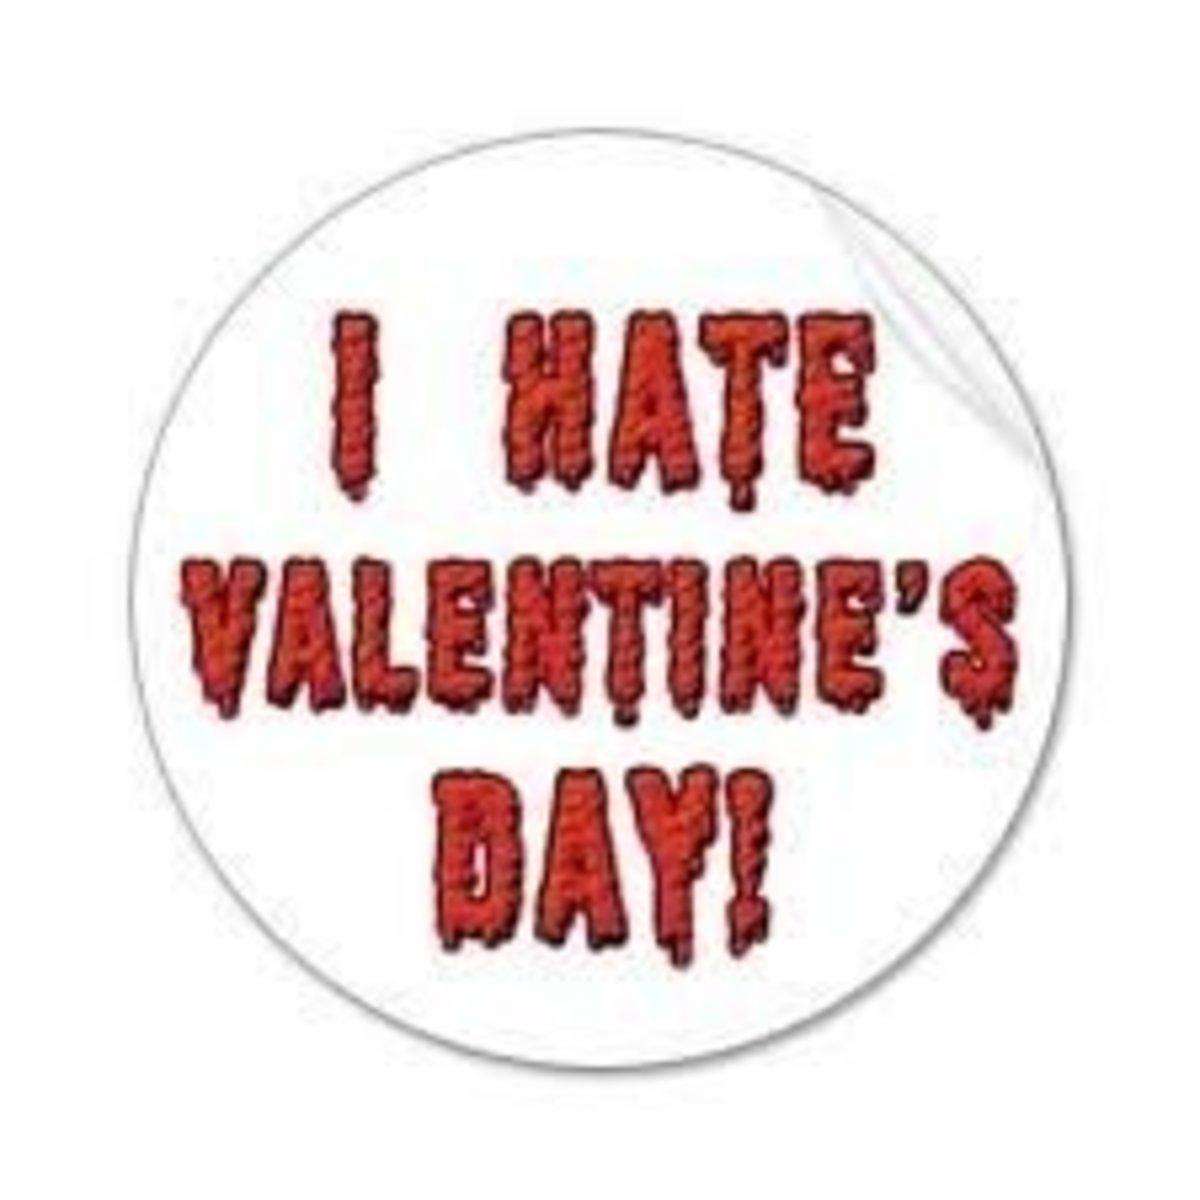 anti-valentines day, anti-valentines day party, i hate valentines day, single for valentines day